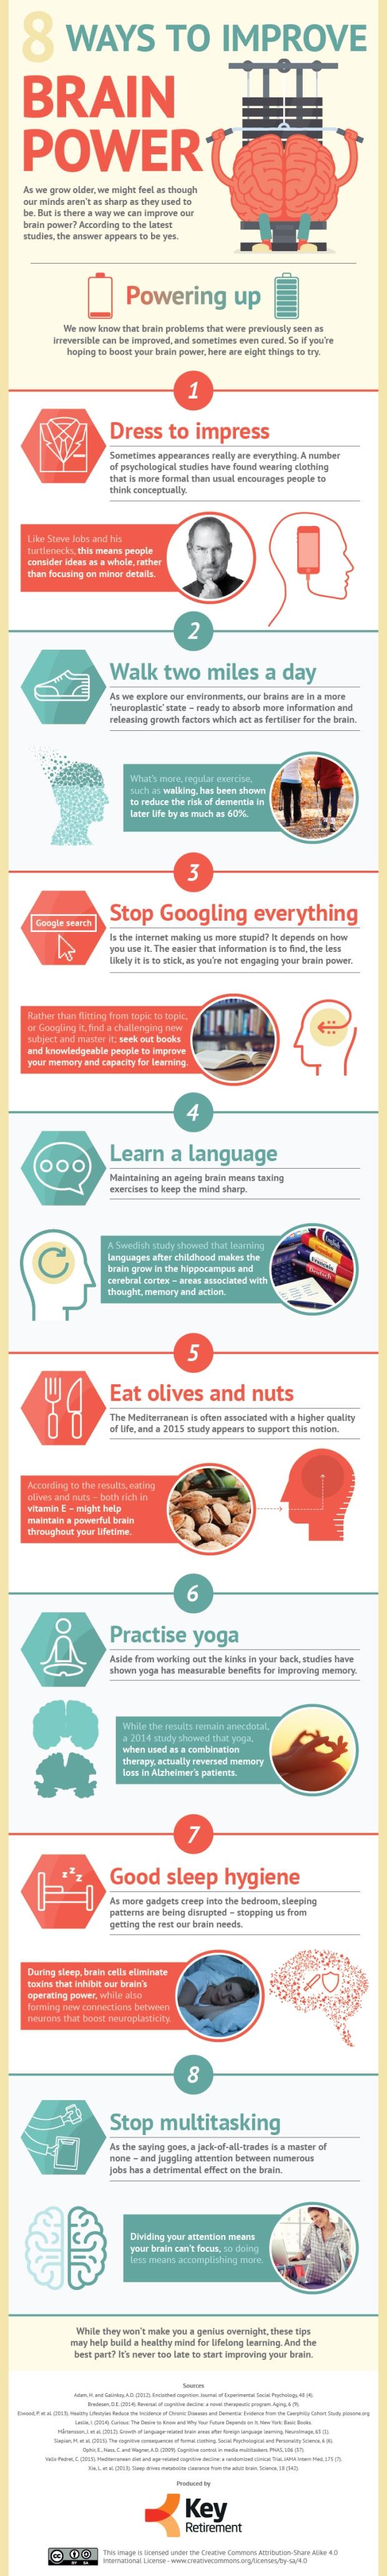 8 Ways To Improve Brain Power - Infographic